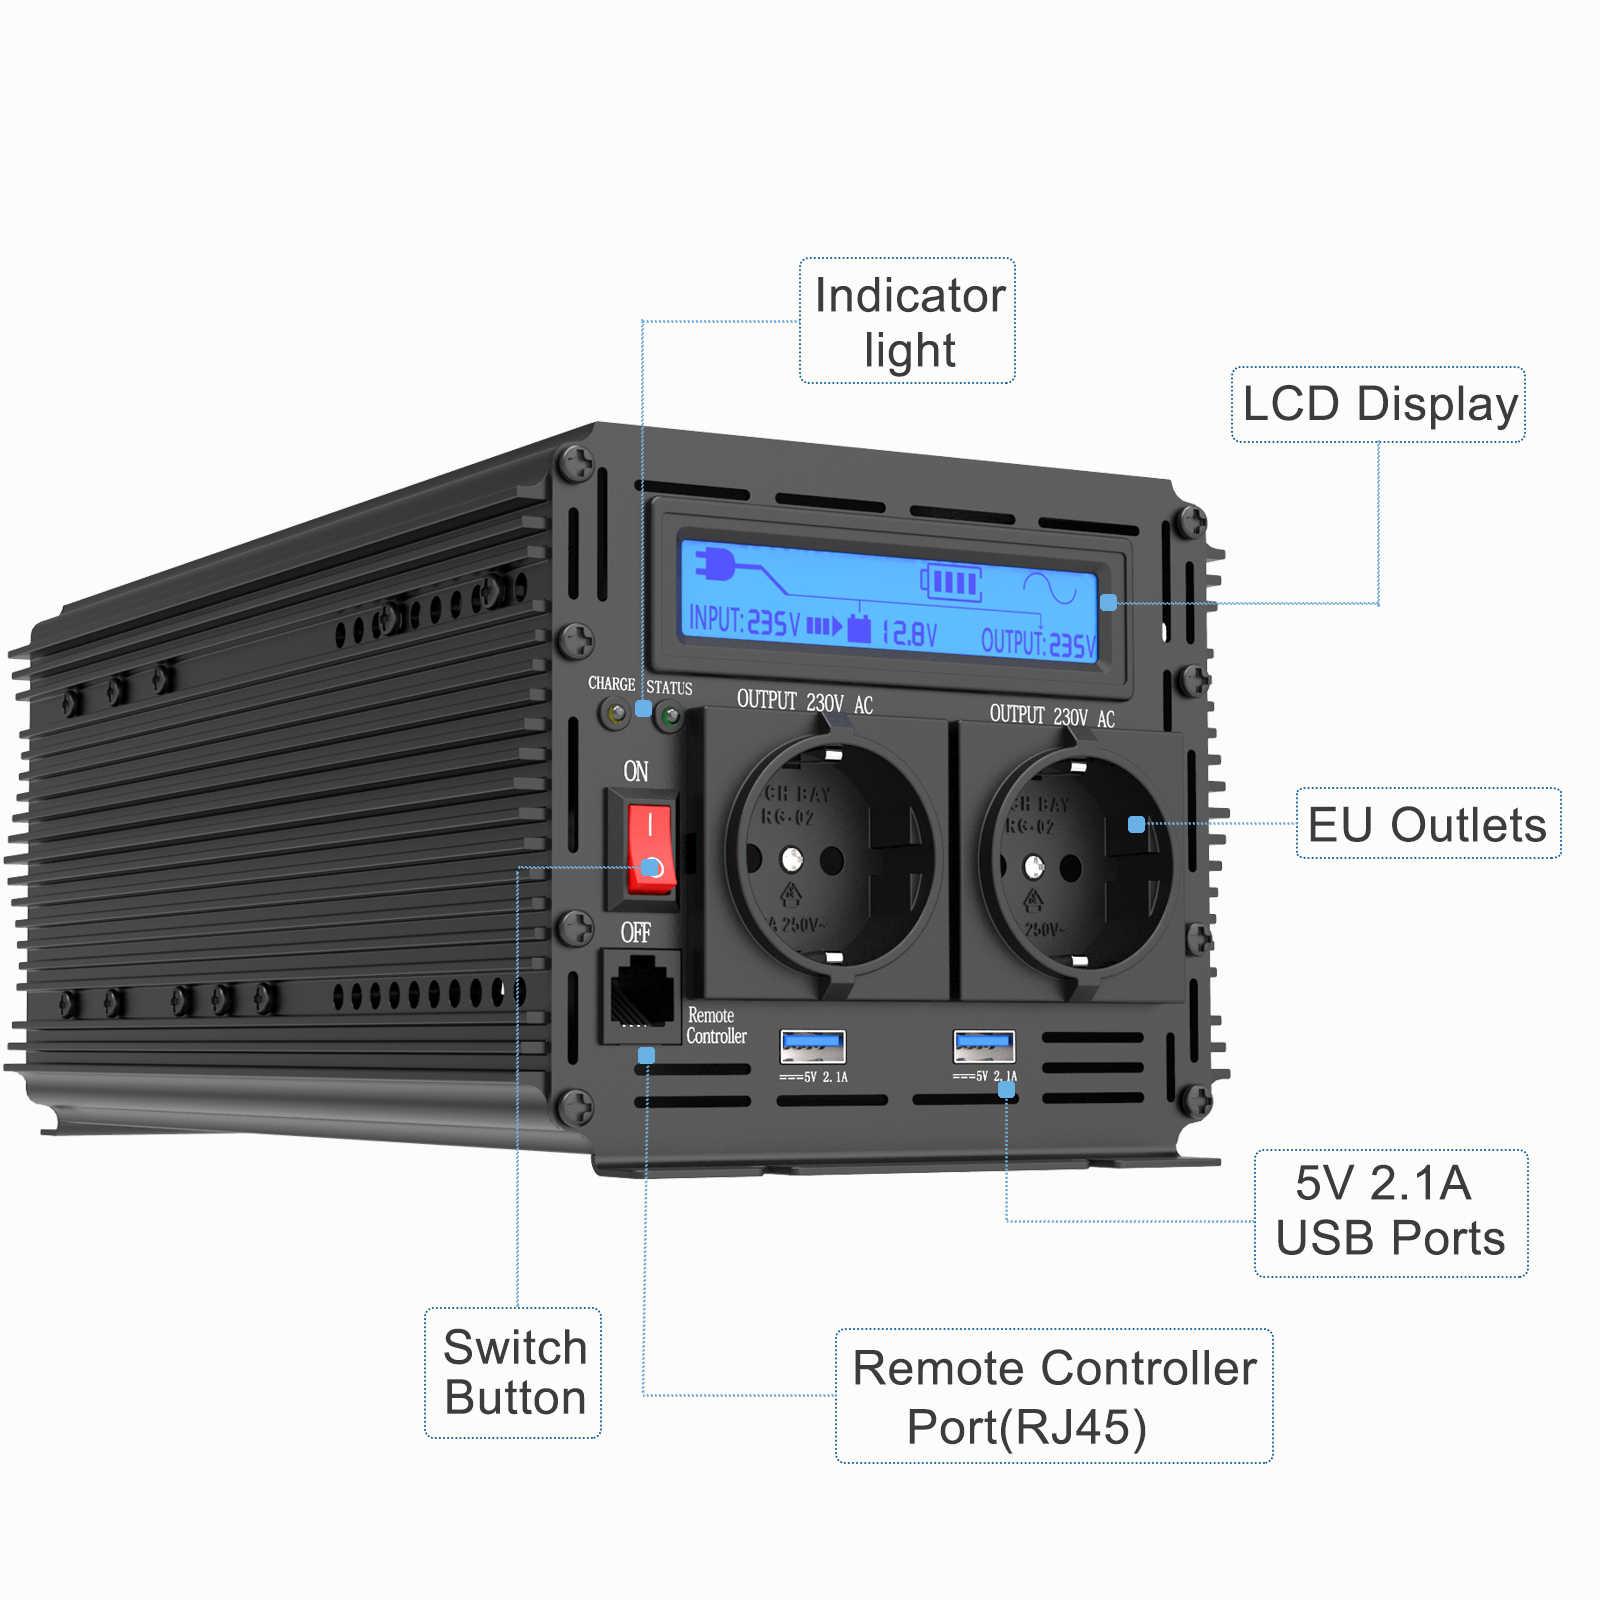 Ładowarka EDECOA UPS przetwornica napięcia 1500W 3000W czysta fala sinusoidalna DC 12V AC 220V 230V z 5V 2.1A USB pilot LCD